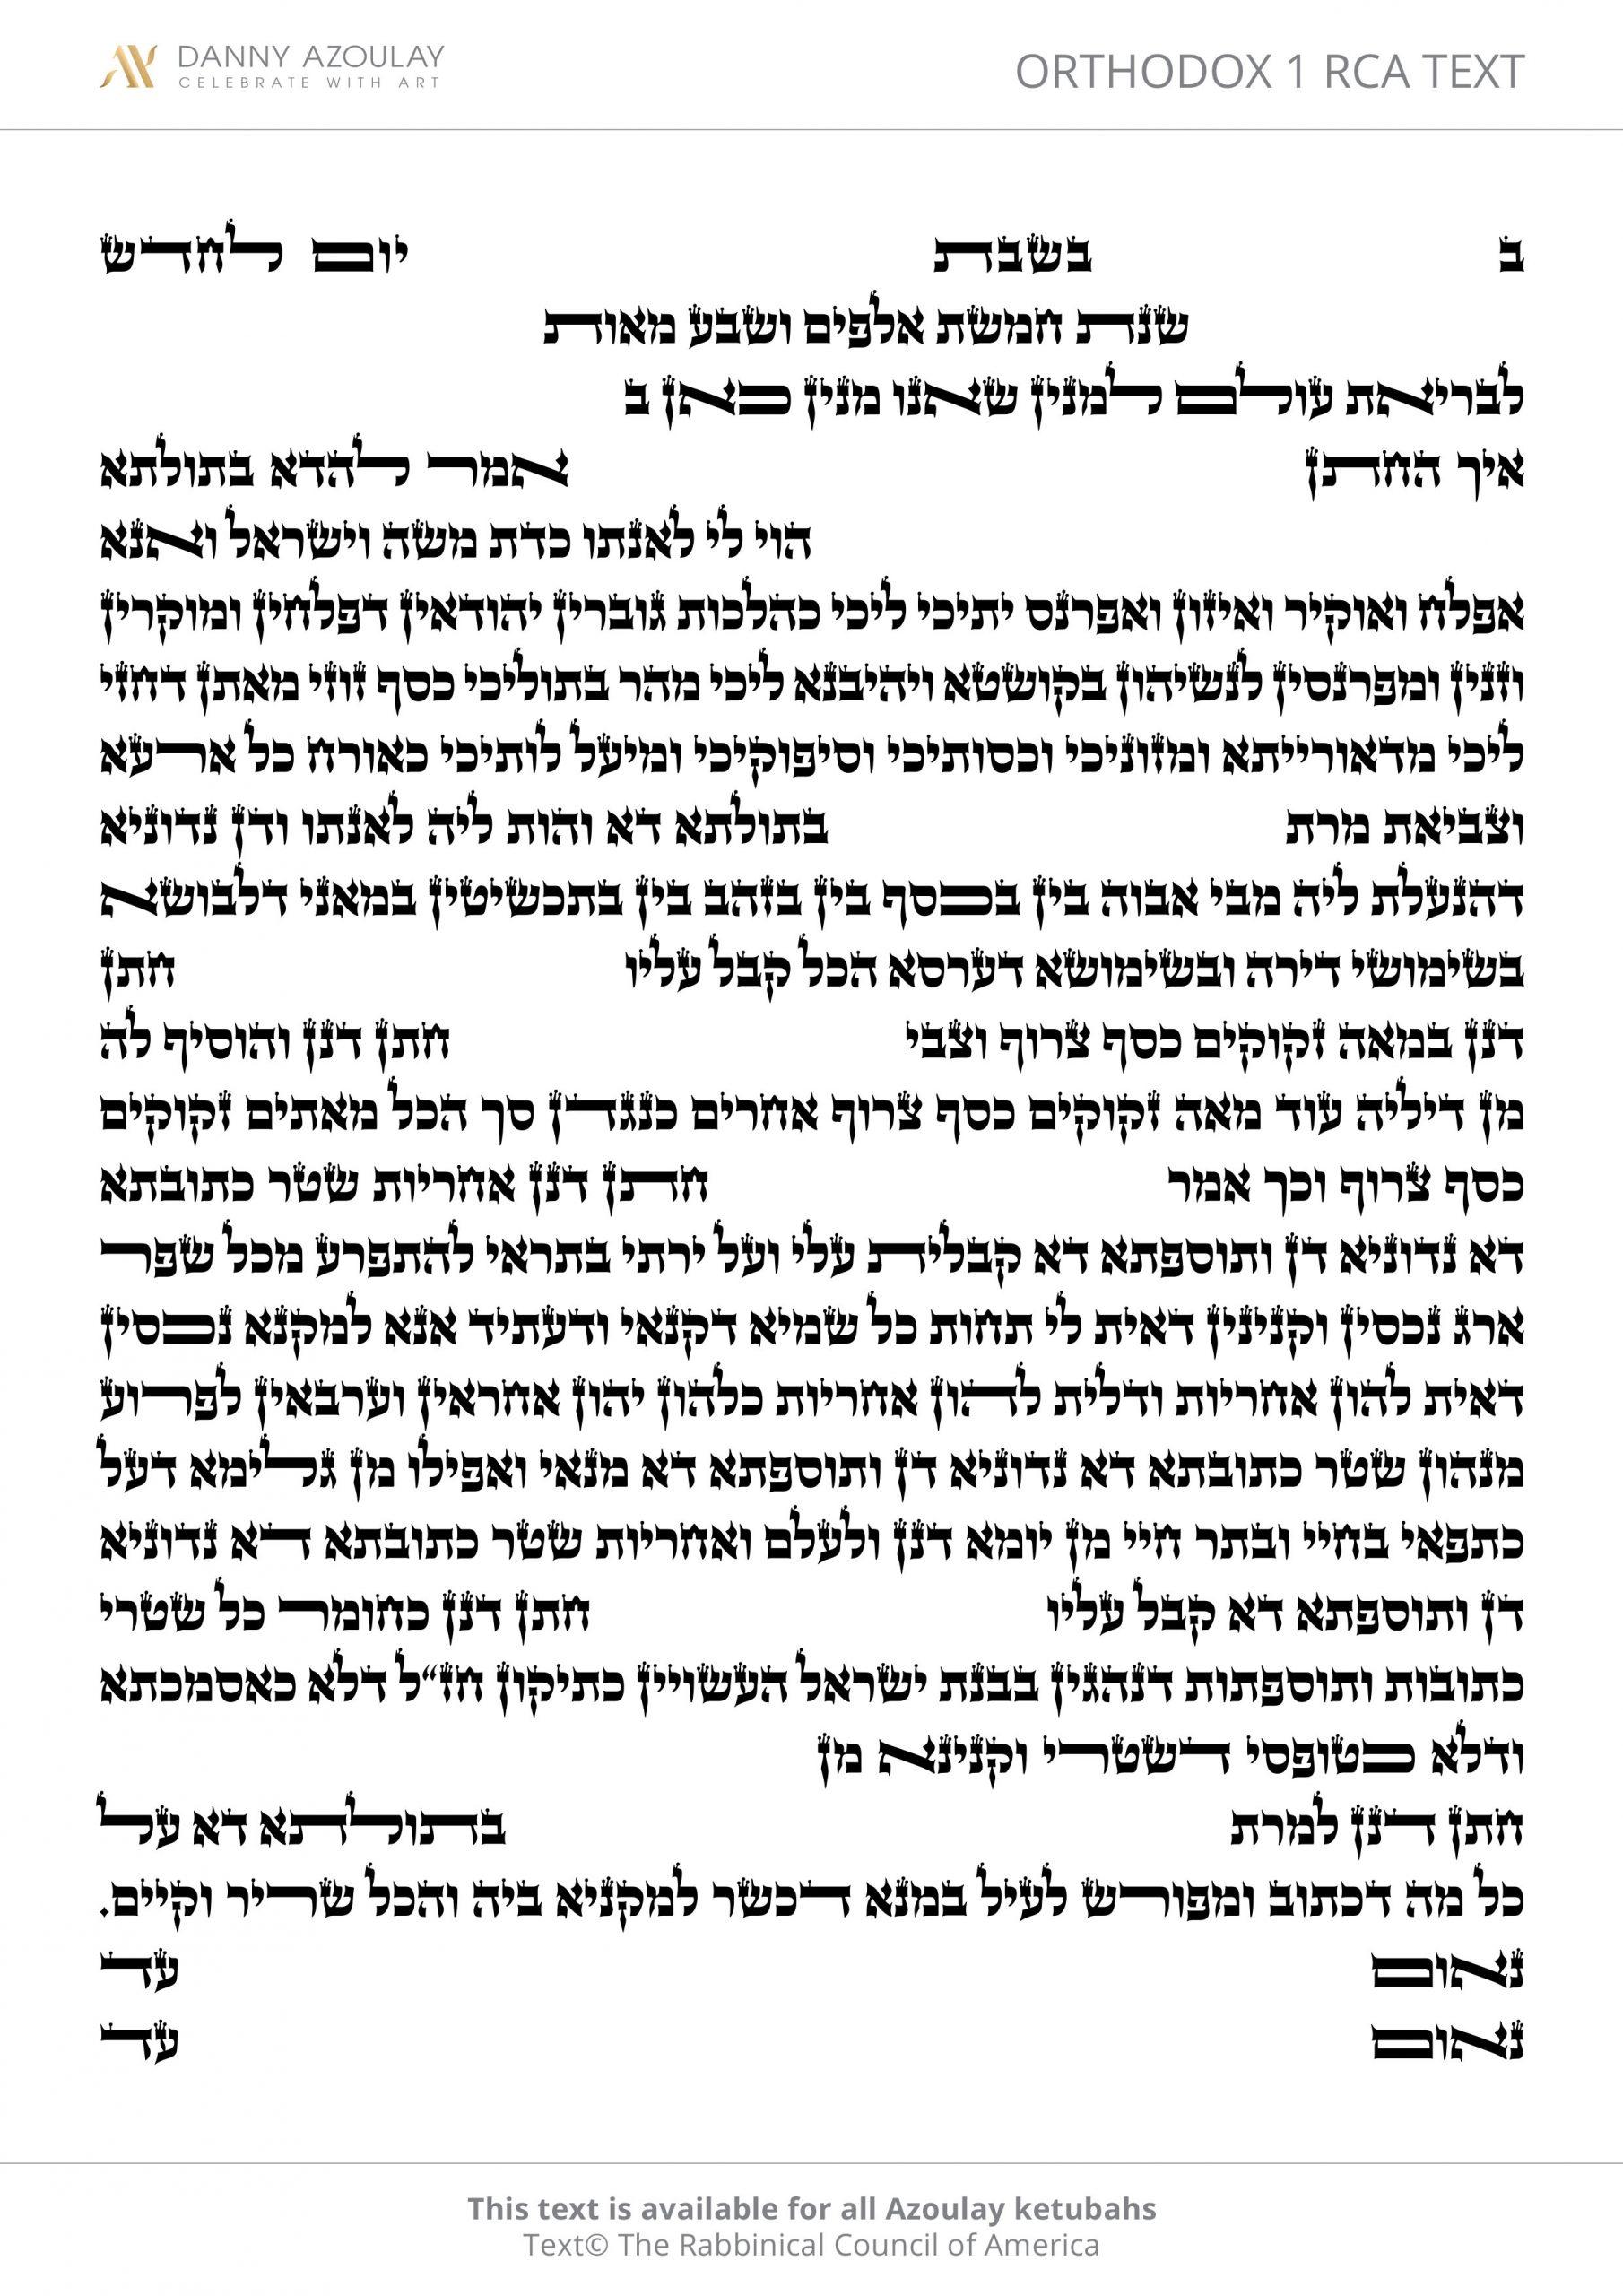 Orthodox Text 1